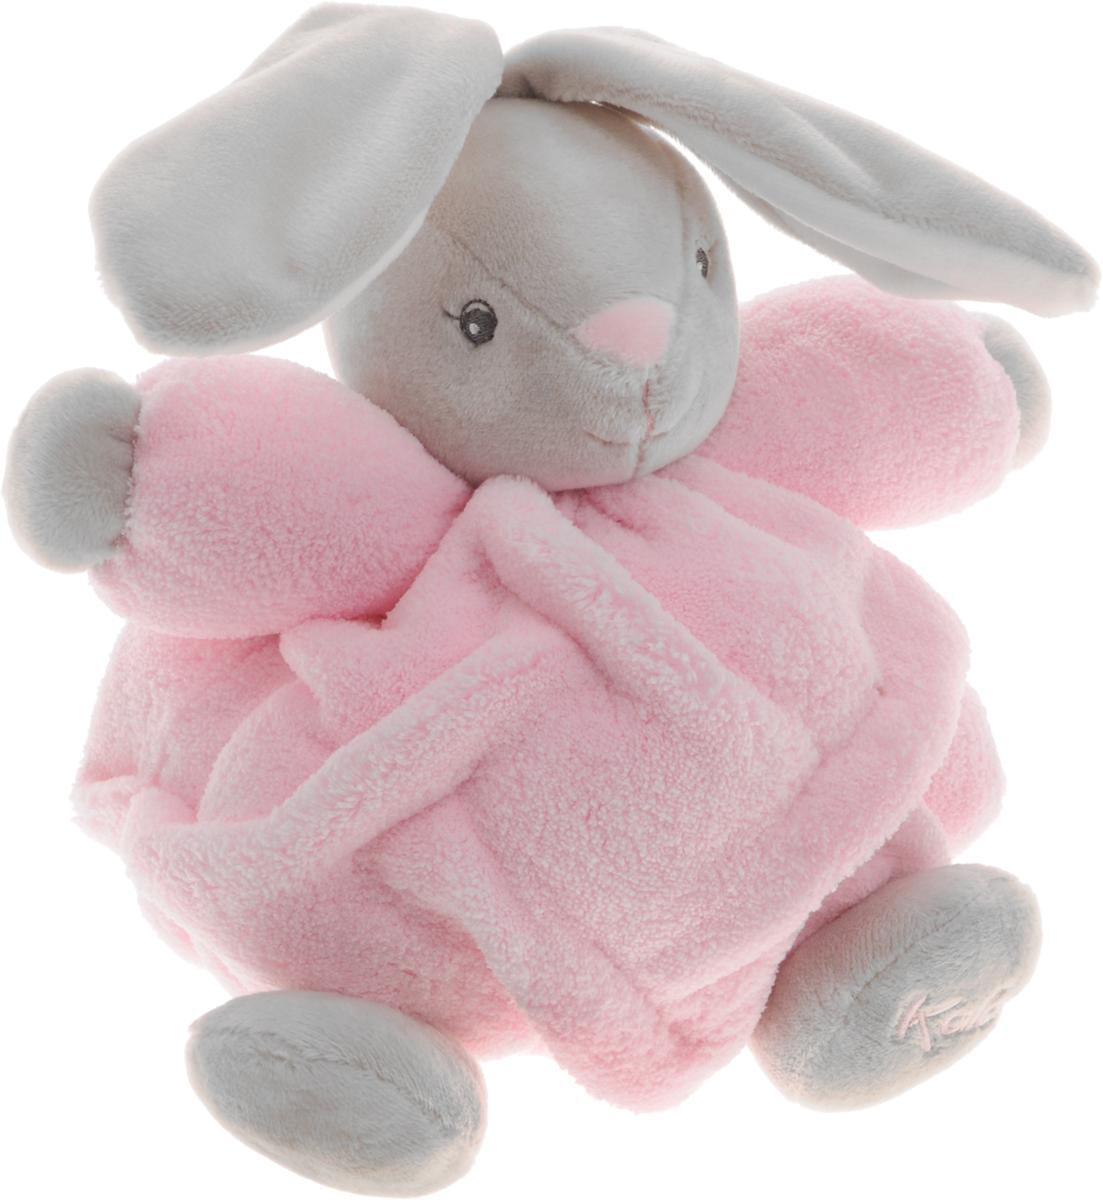 Kaloo Мягкая музыкальная игрушка Заяц цвет розовый серый 17 см мягкие игрушки kaloo овечка 45 см коллекция друзья